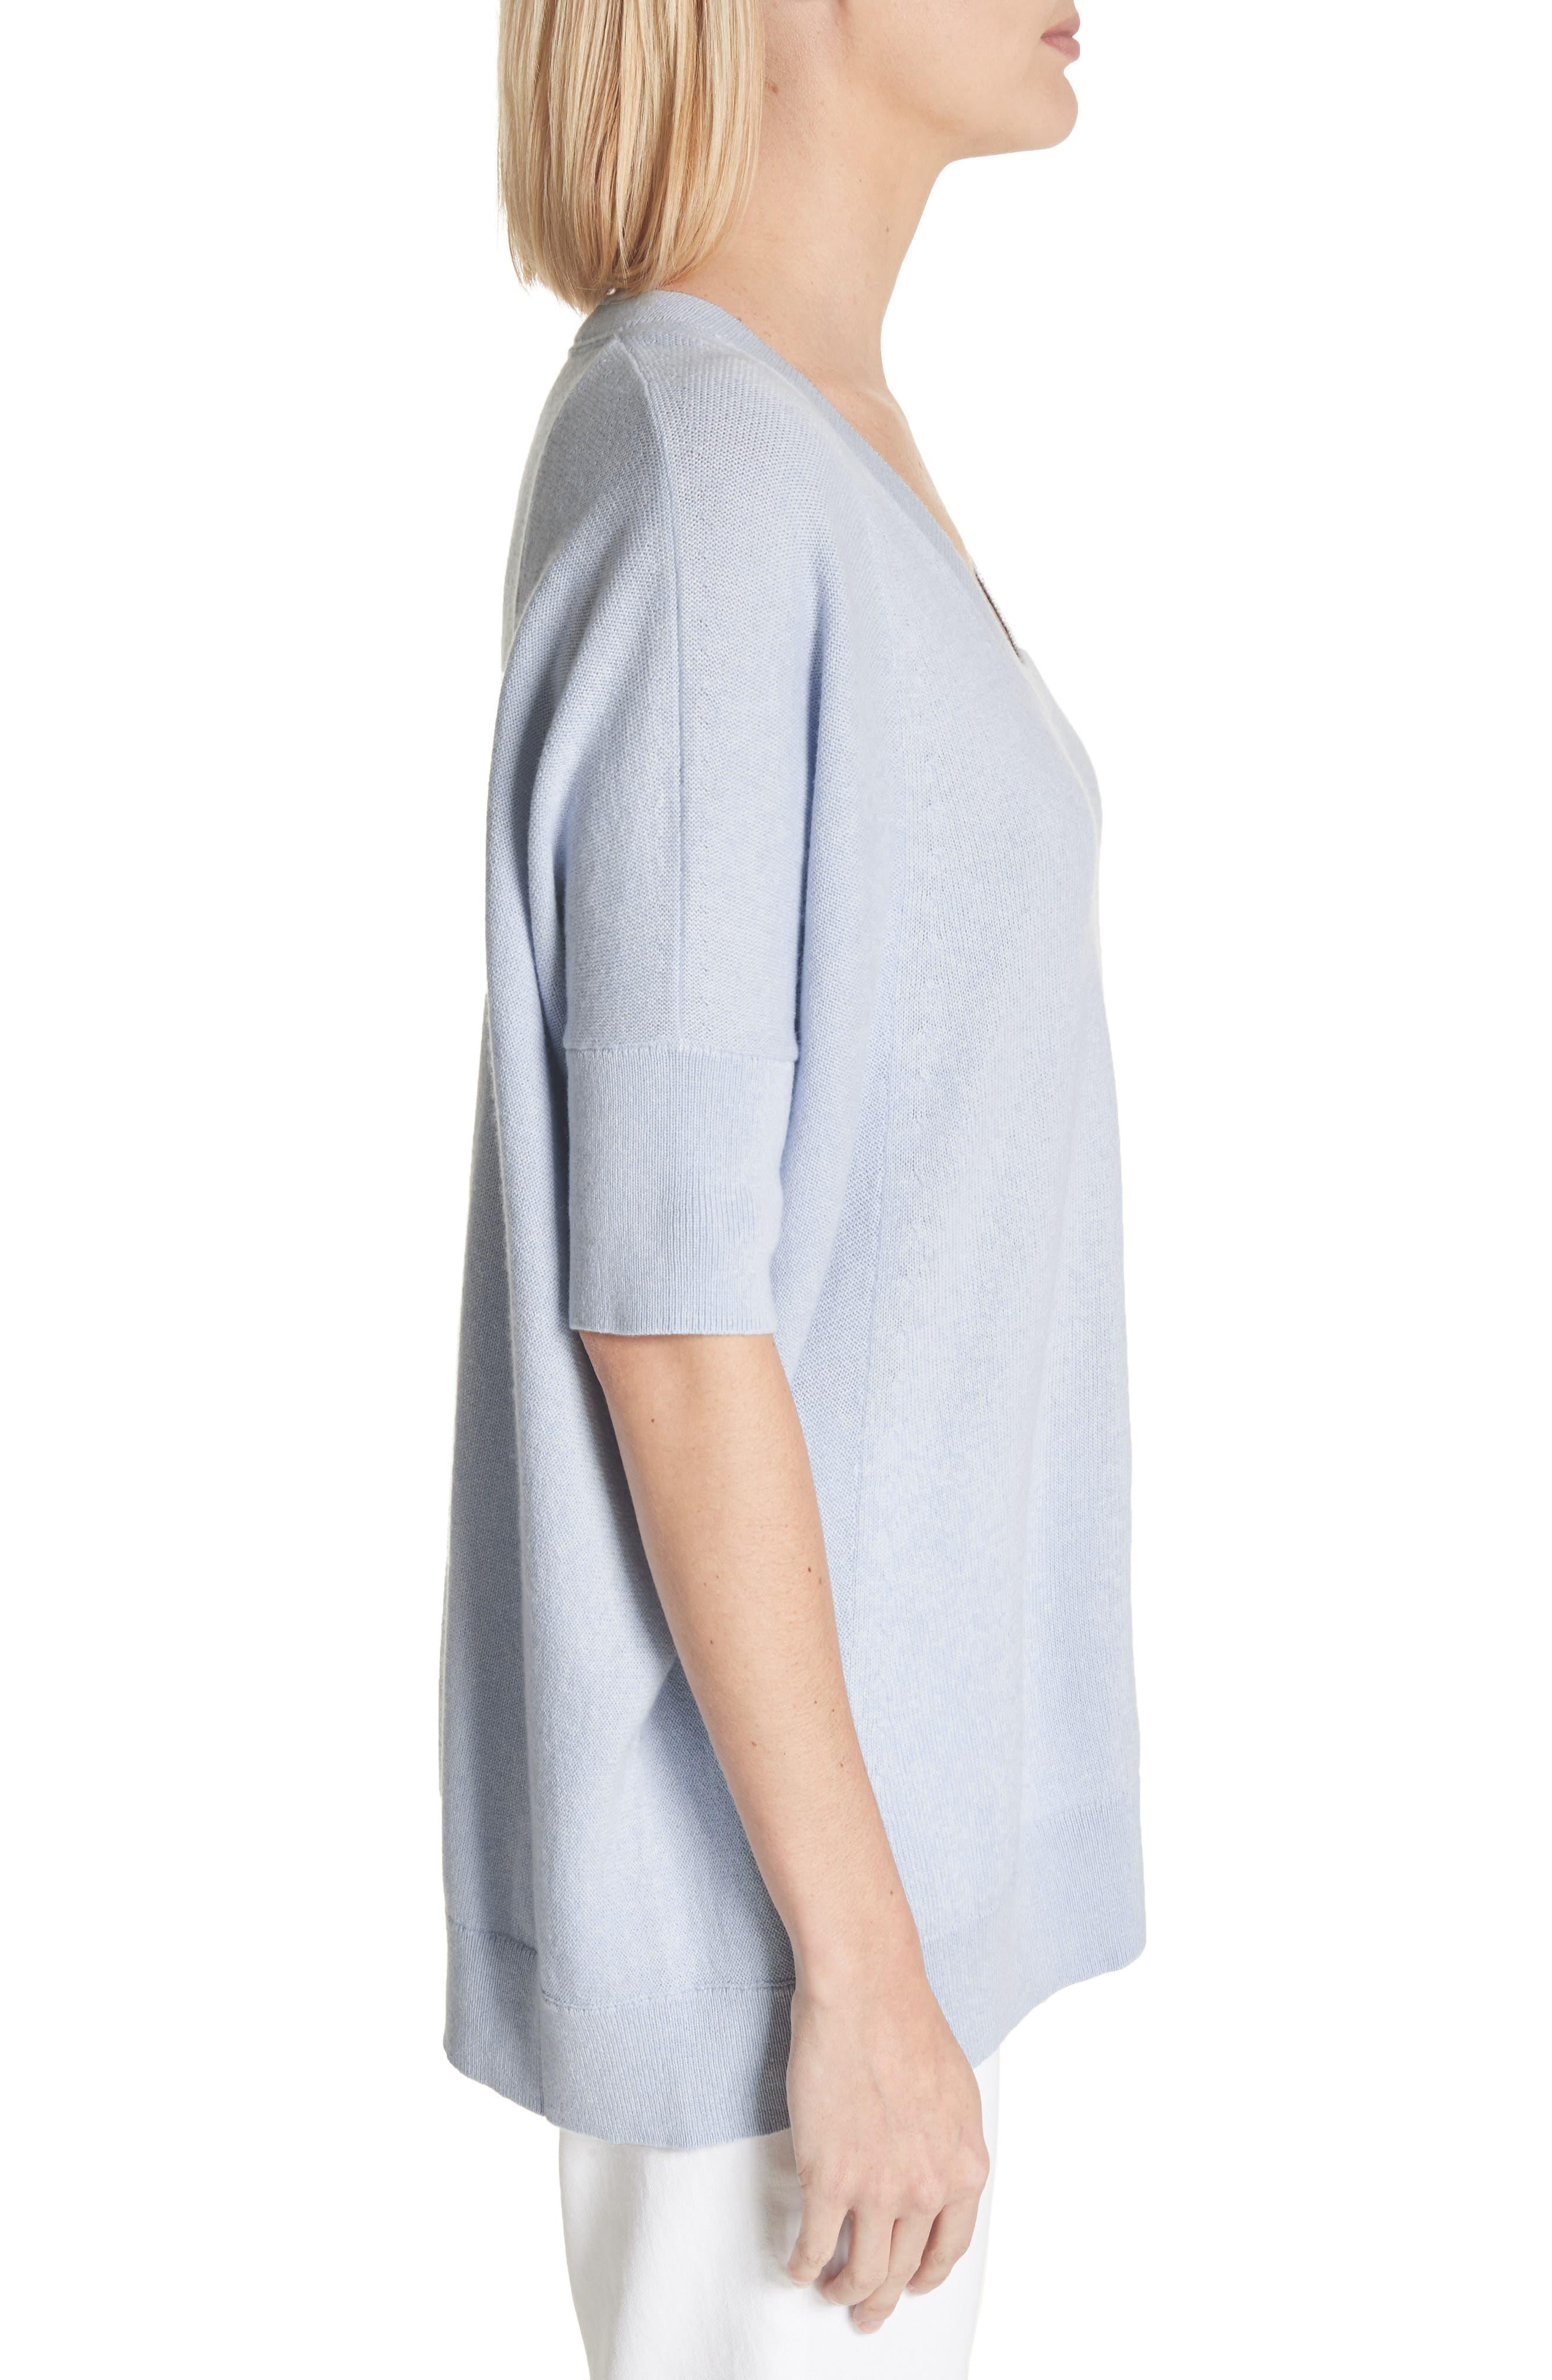 Cotton, Cashmere & Silk Oversized Scoop Neck Sweater,                             Alternate thumbnail 3, color,                             Pale Blue Melange